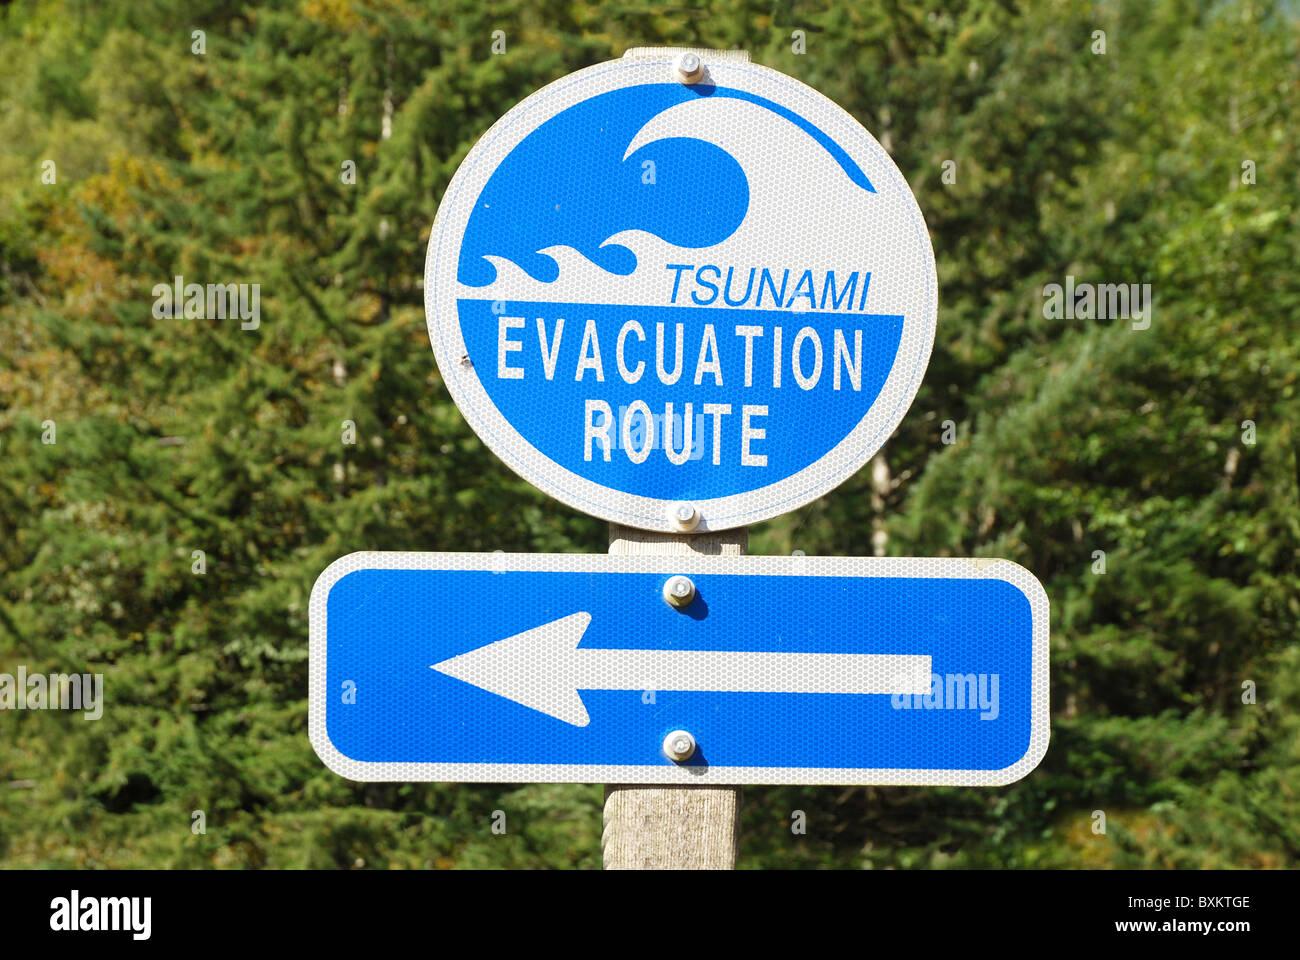 Tsunami Evacuation Route road sign with arrow -- Harbor Wave Stock Photo